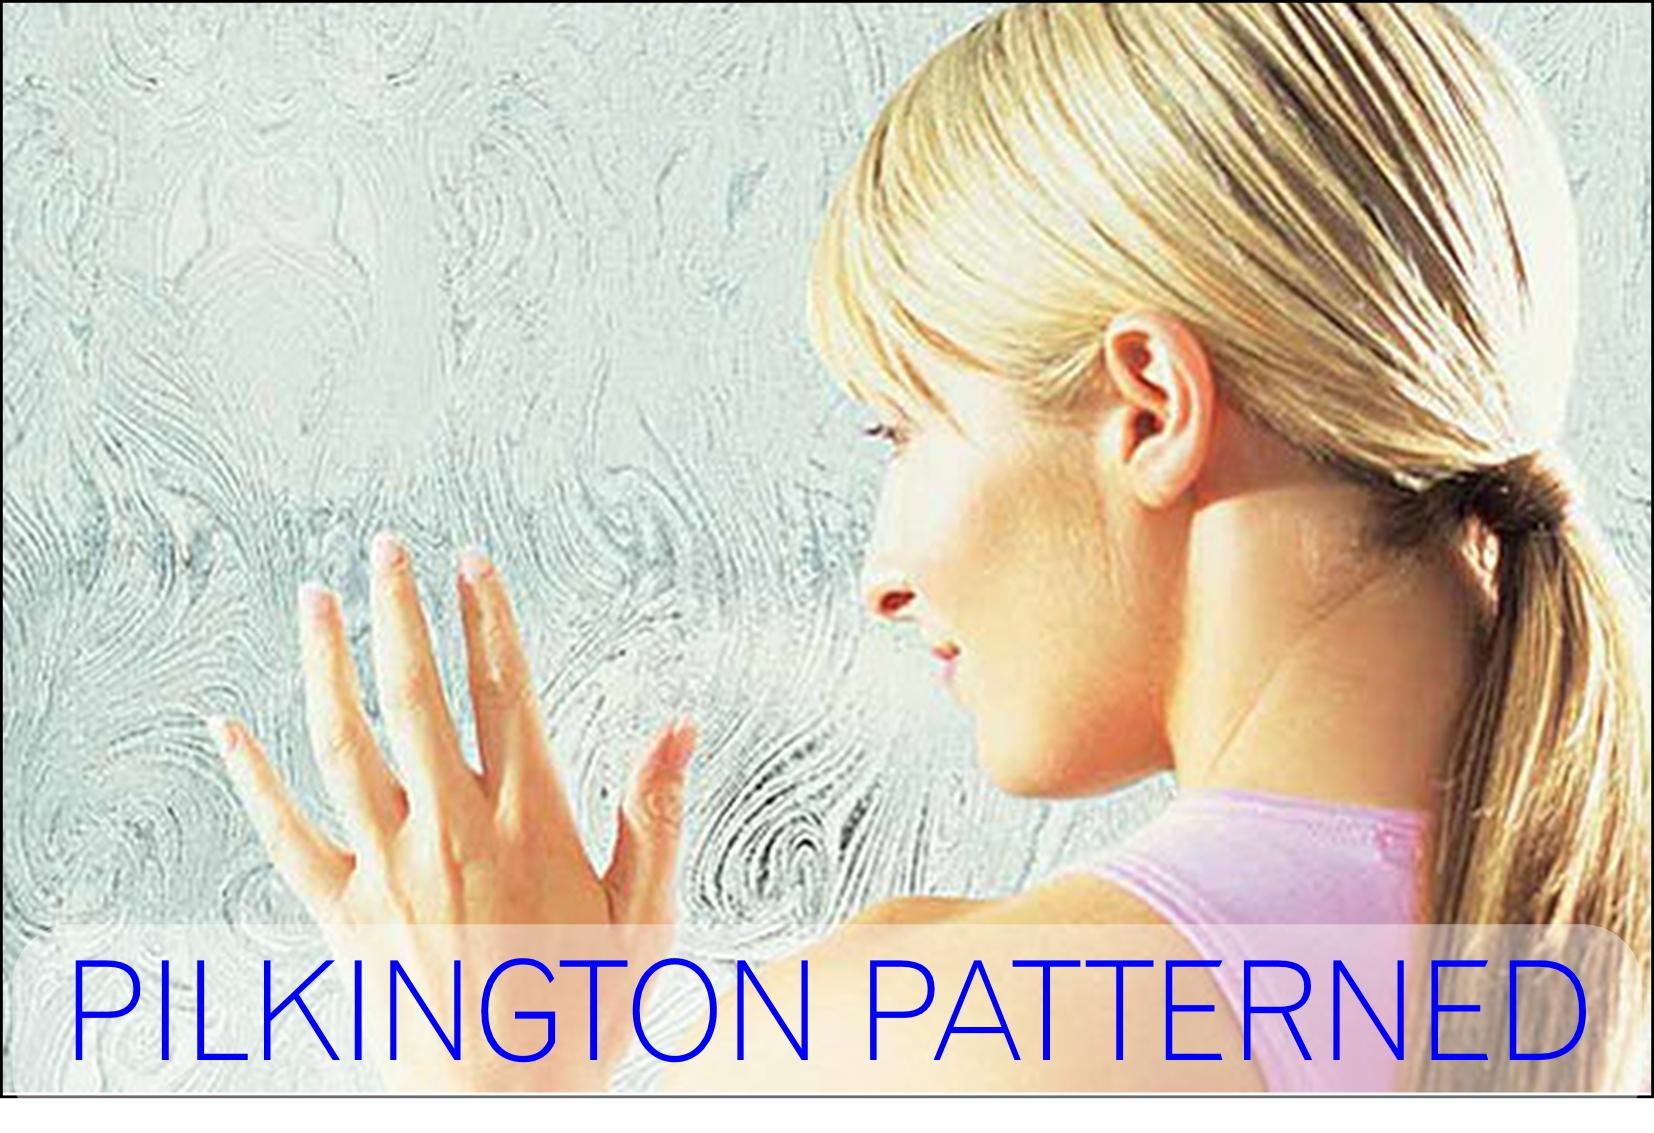 PILKINGTON PATTERNS